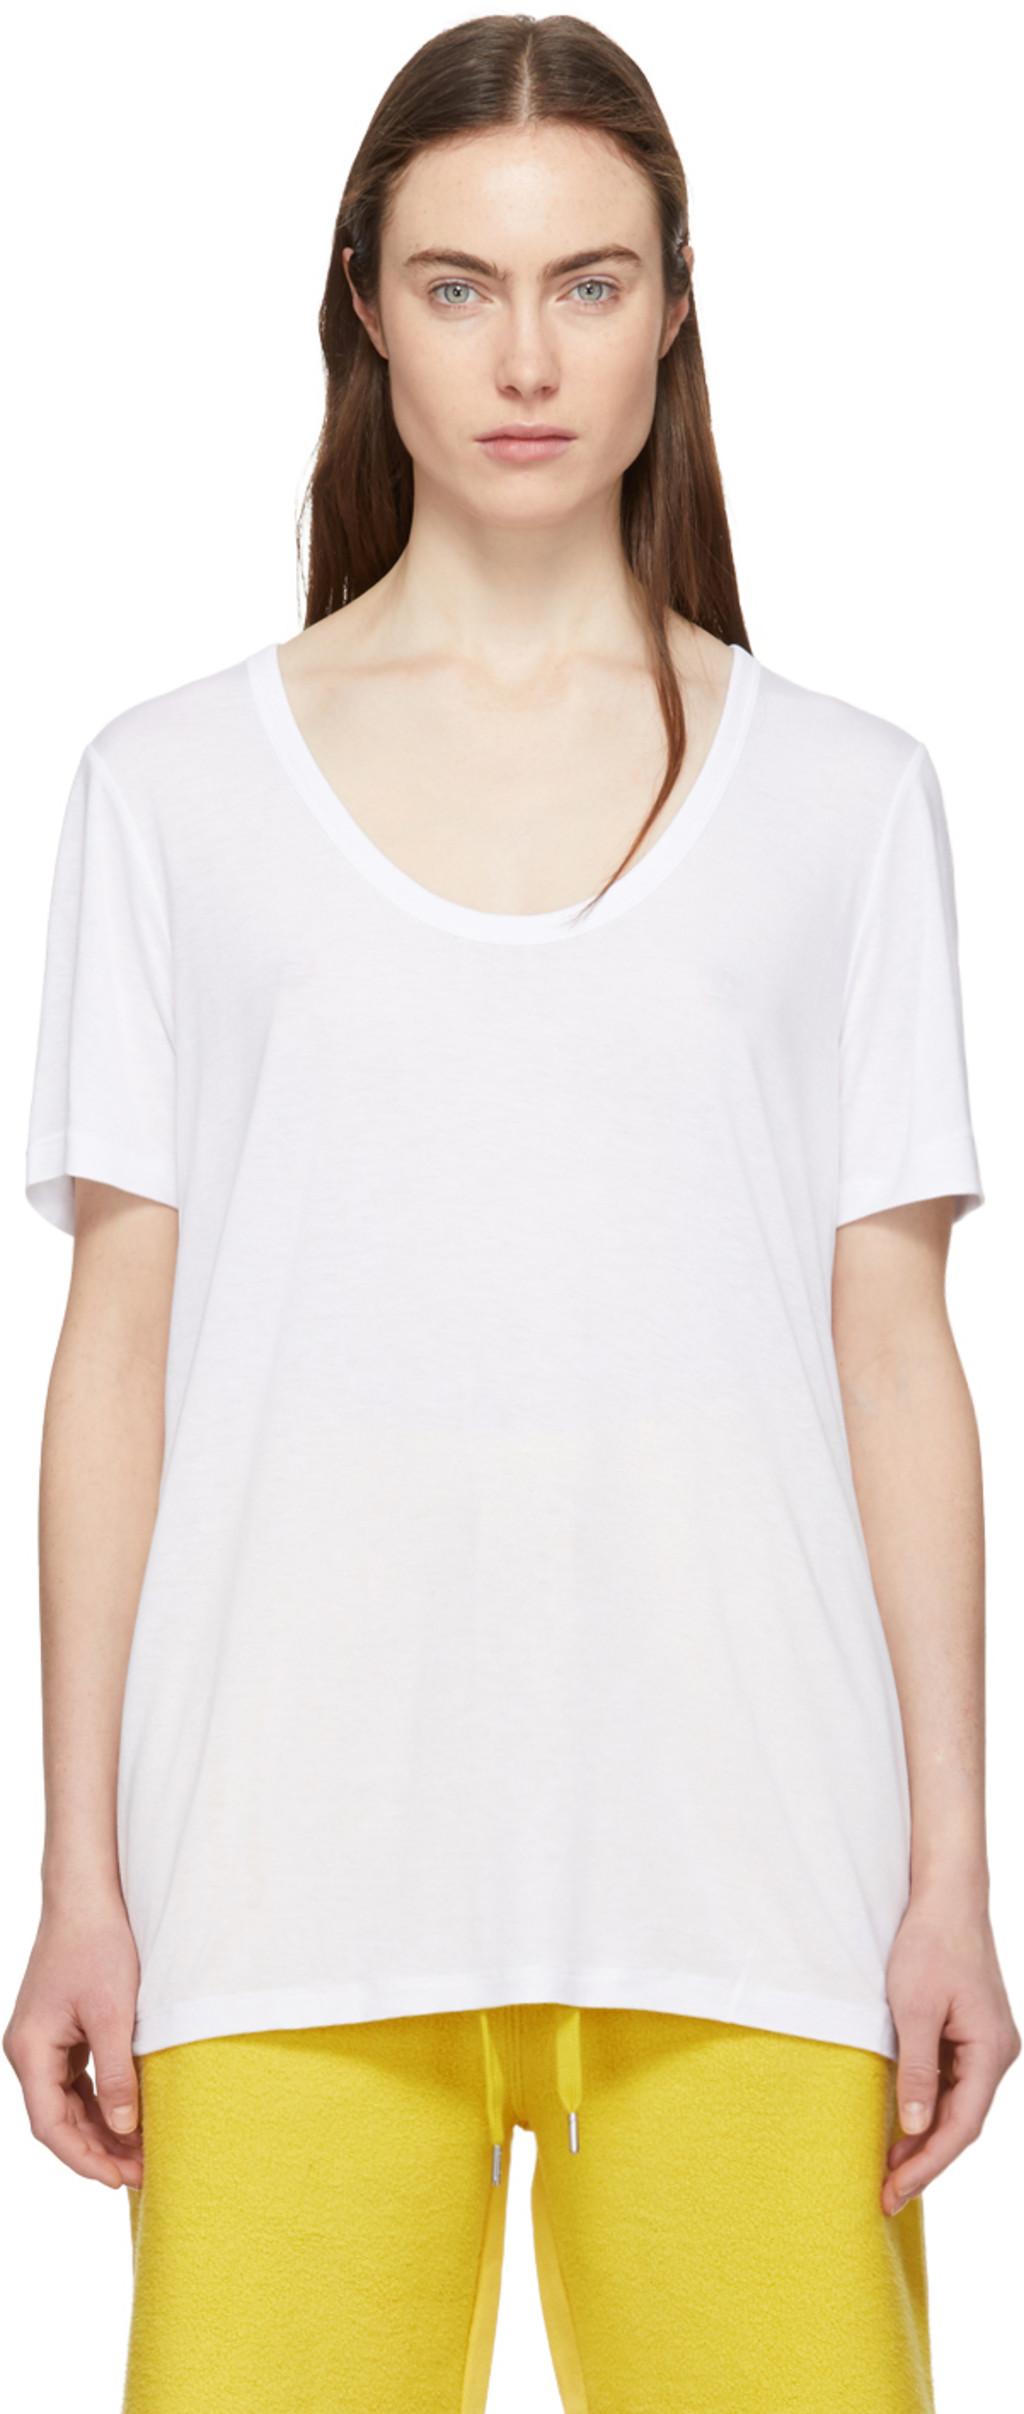 Designer T Shirts For Women Ssense